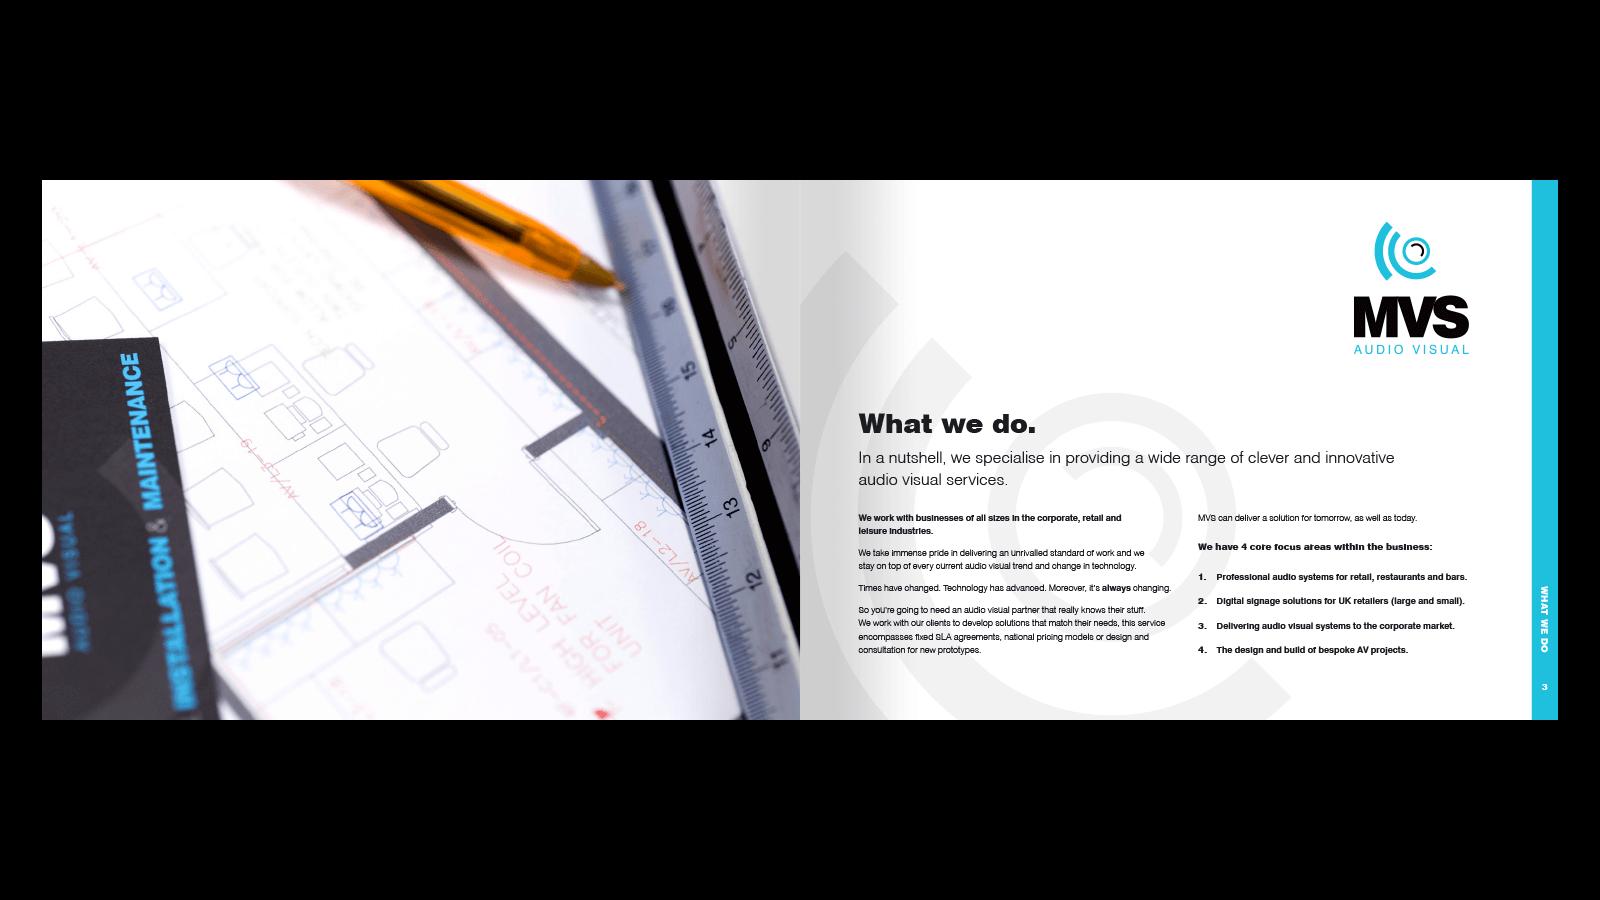 MVS brochure design